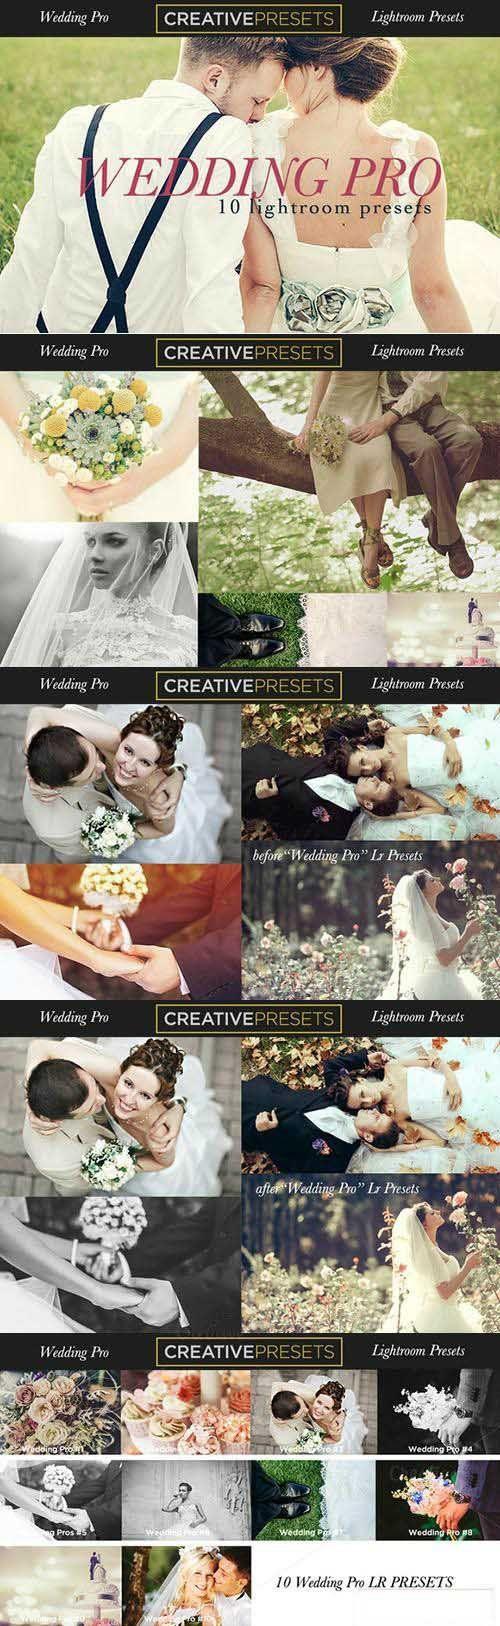 Wedding Pro 10 Lightroom Presets